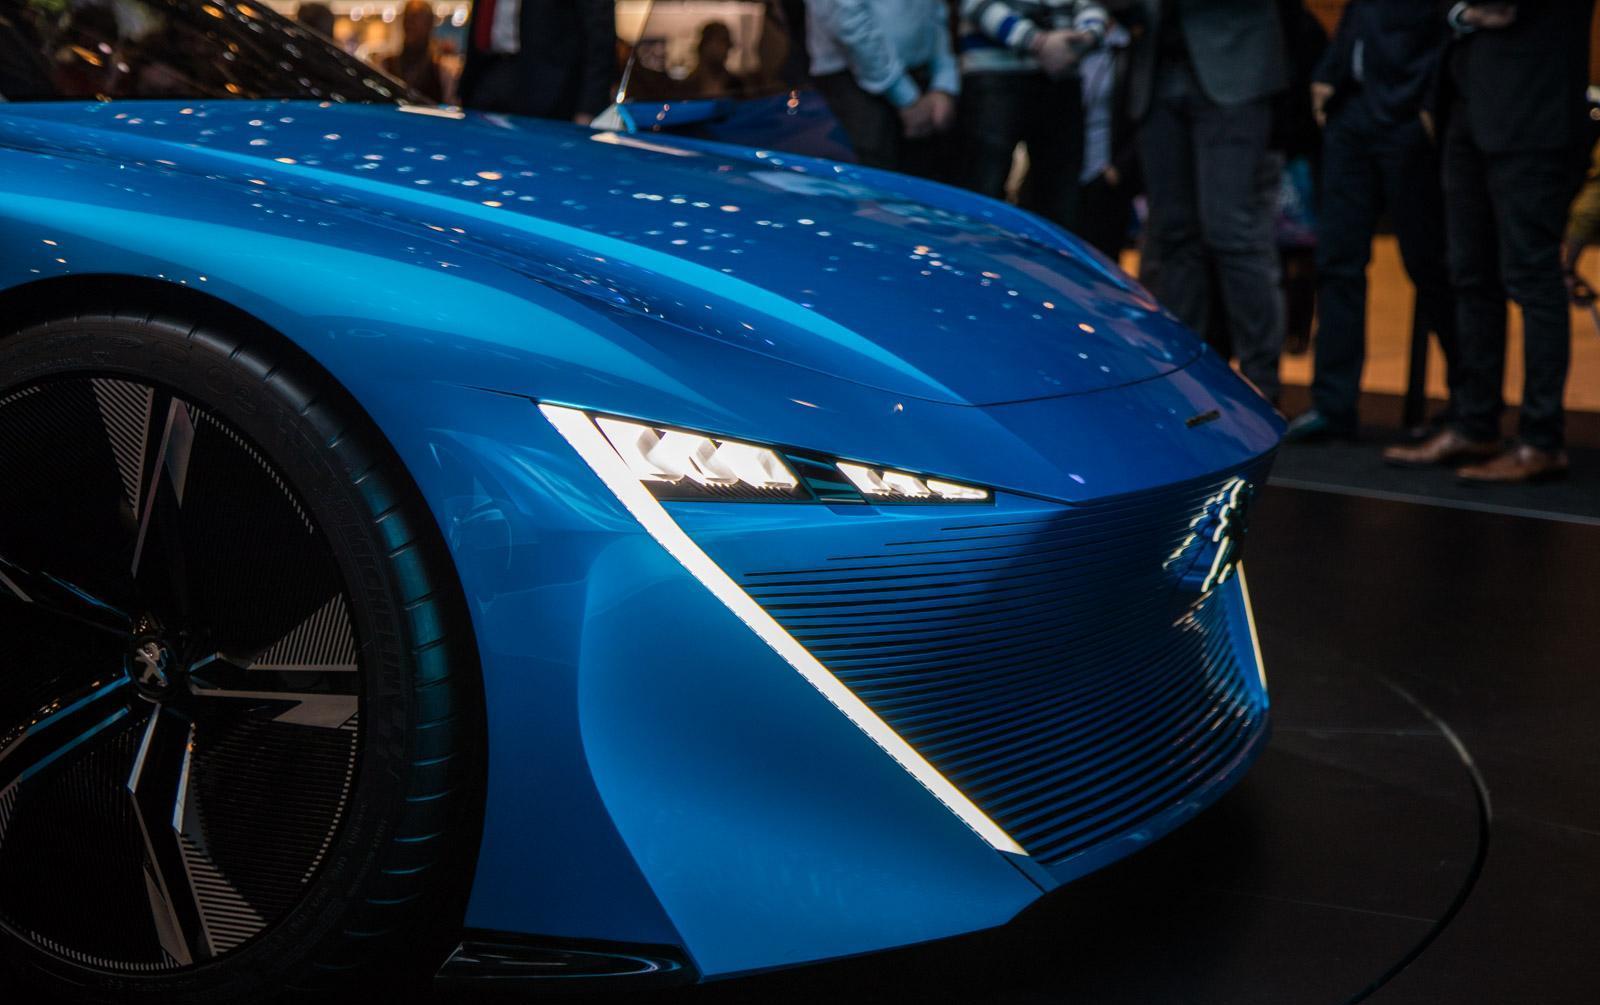 Peugeot-instinct-concept-002